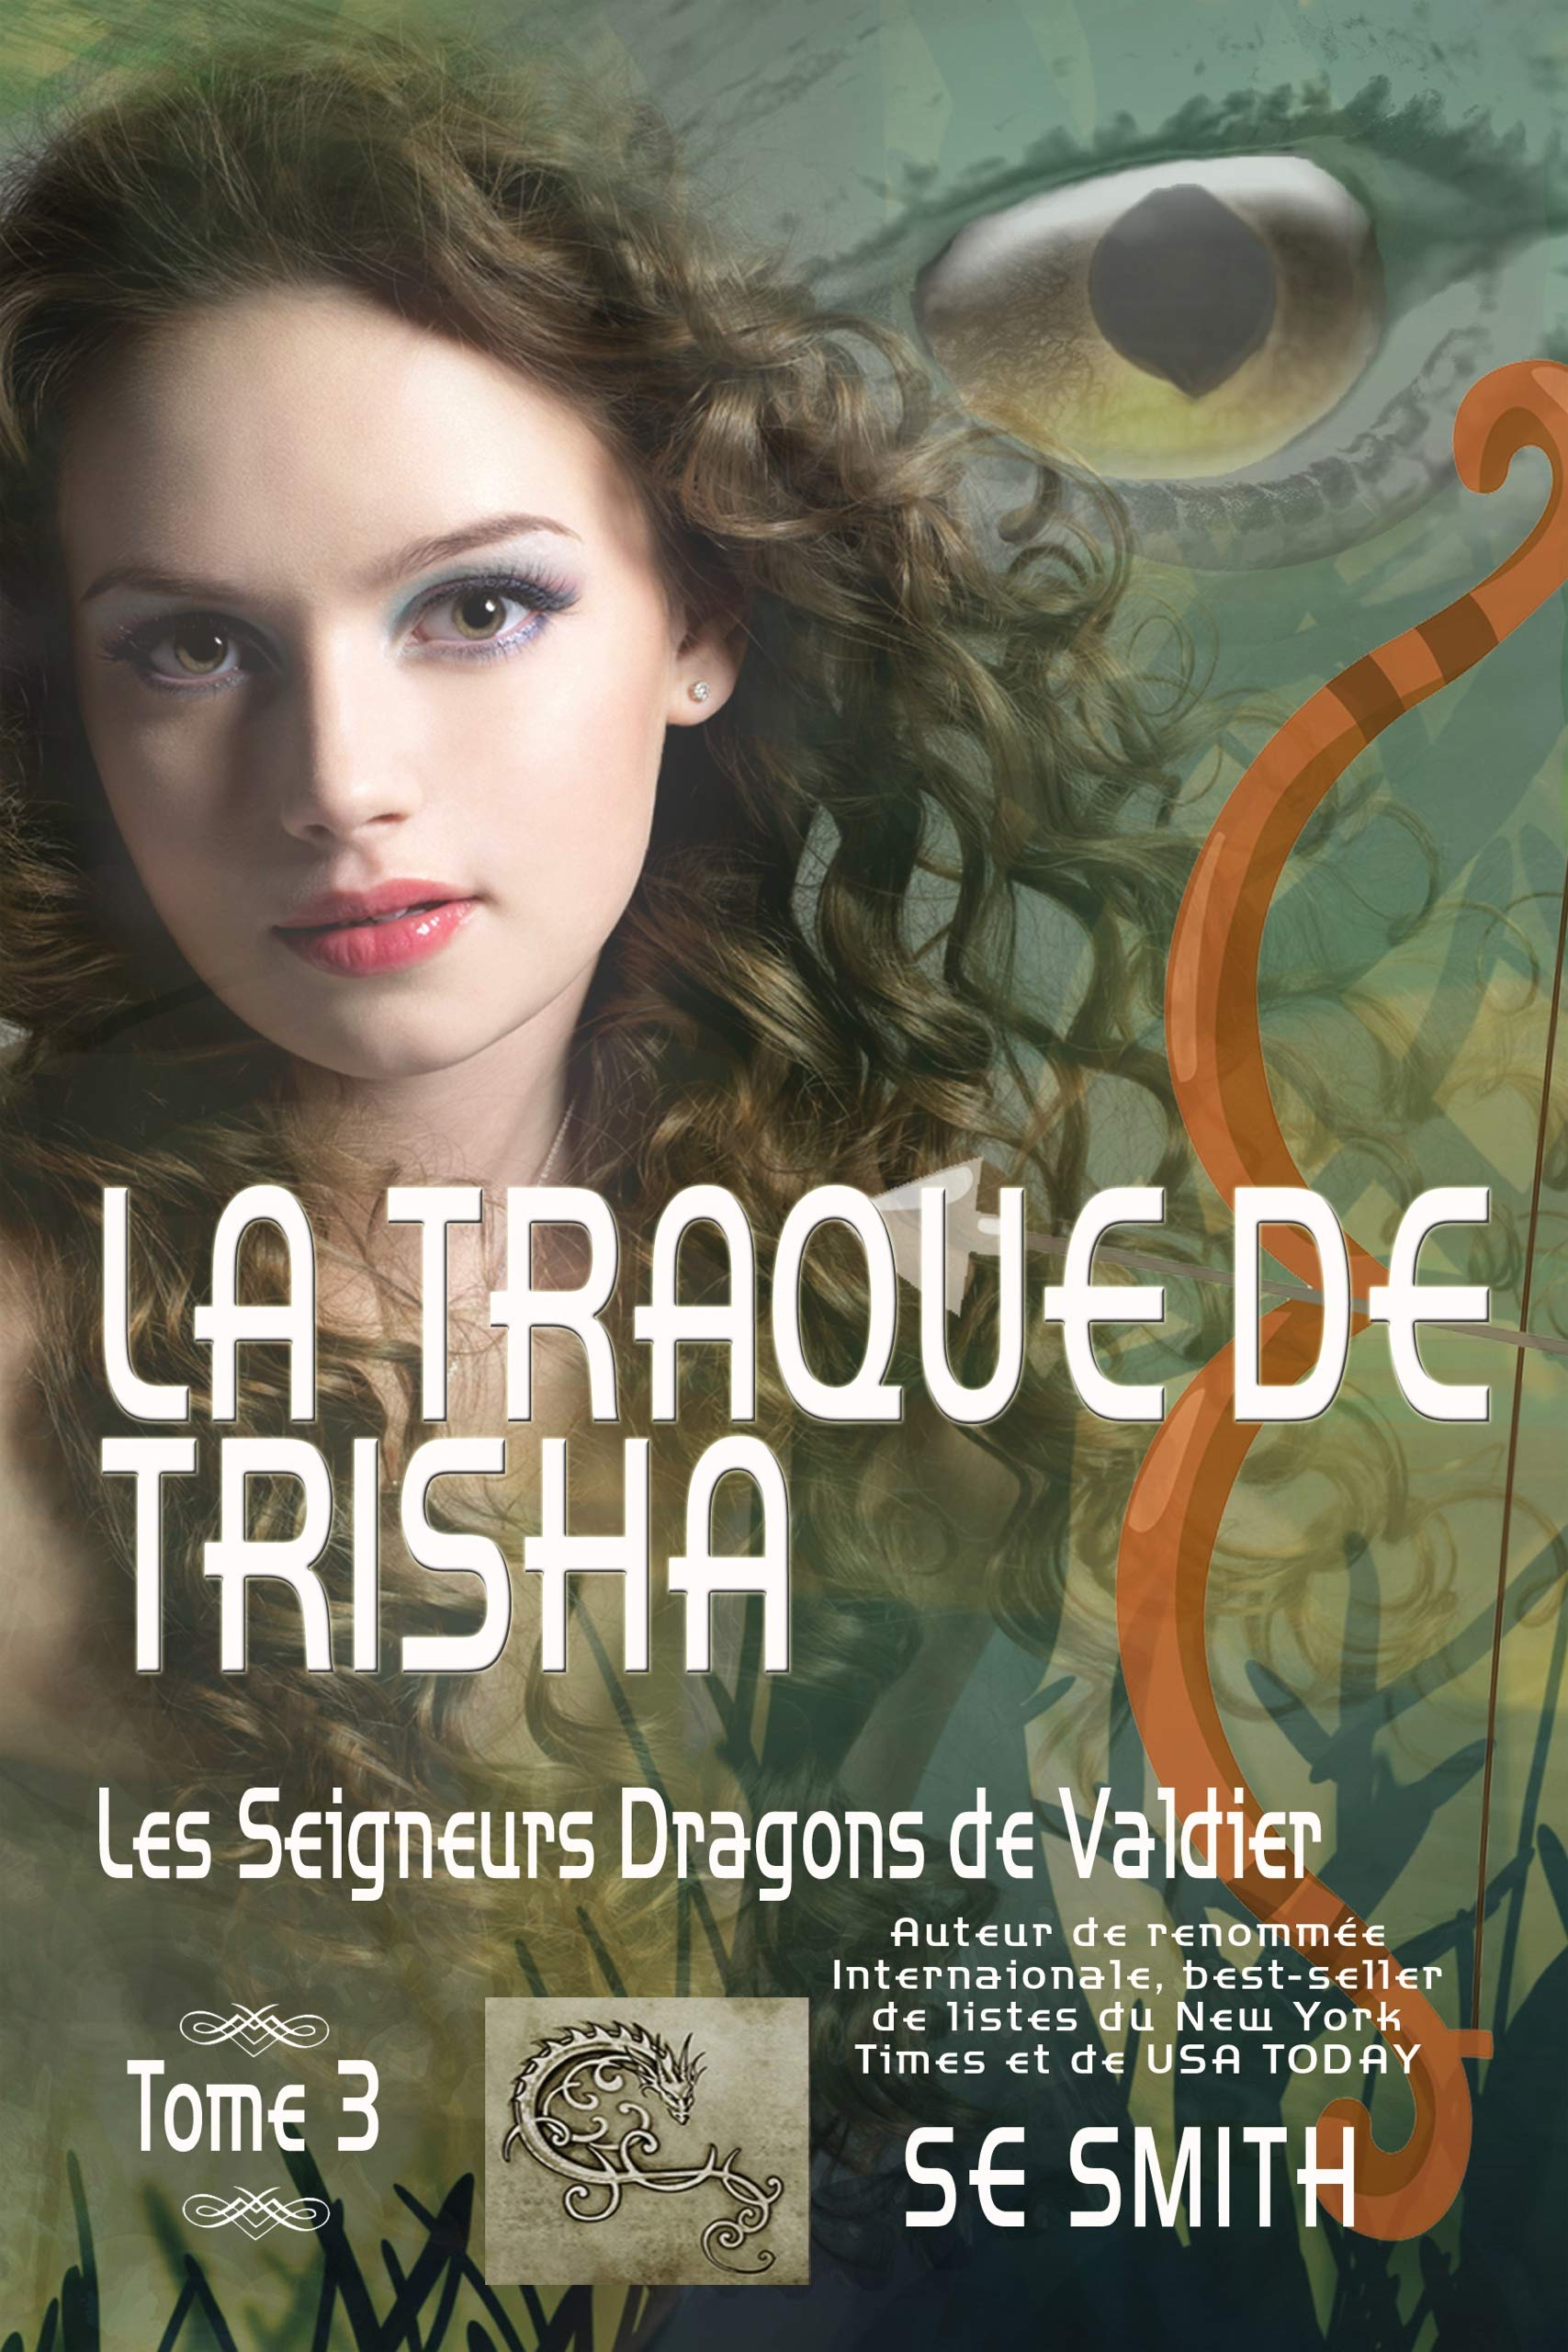 La traque de Trisha: Les Seigneurs Dragons de Valdier Tome 3 por S.E. Smith